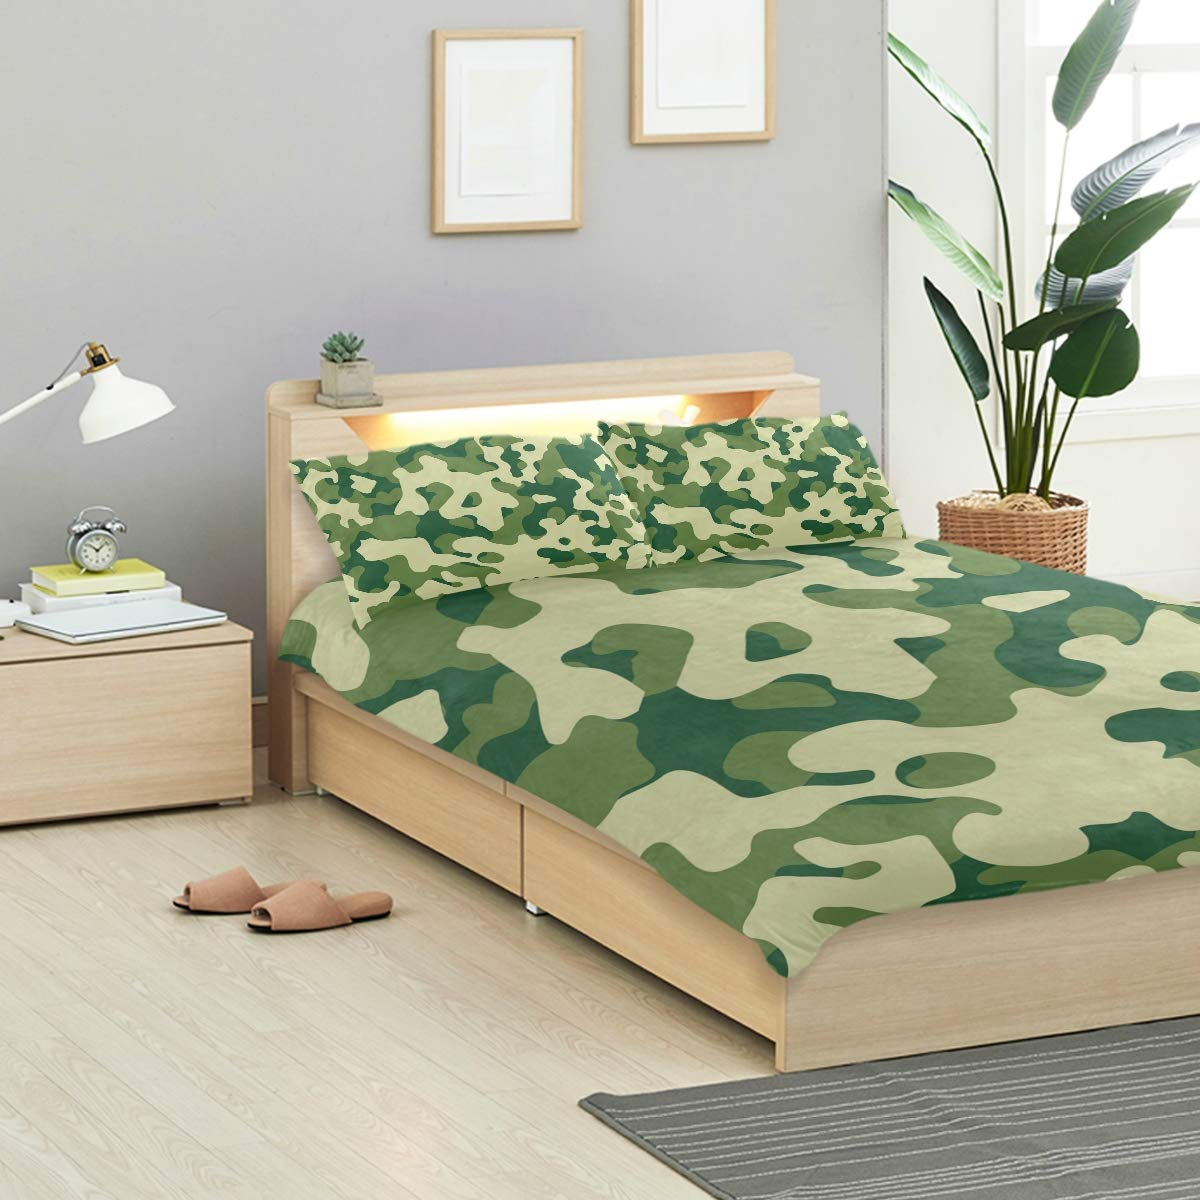 Camouflage Green Pattern 3 Piece Duvet Cover Set 1 Duvet Cover 2 Pillow Shams Crystal Velvet Quilt Cover Pillowcase Pillow Cover for Kid Boy Girl Bedding Sets Twin Size